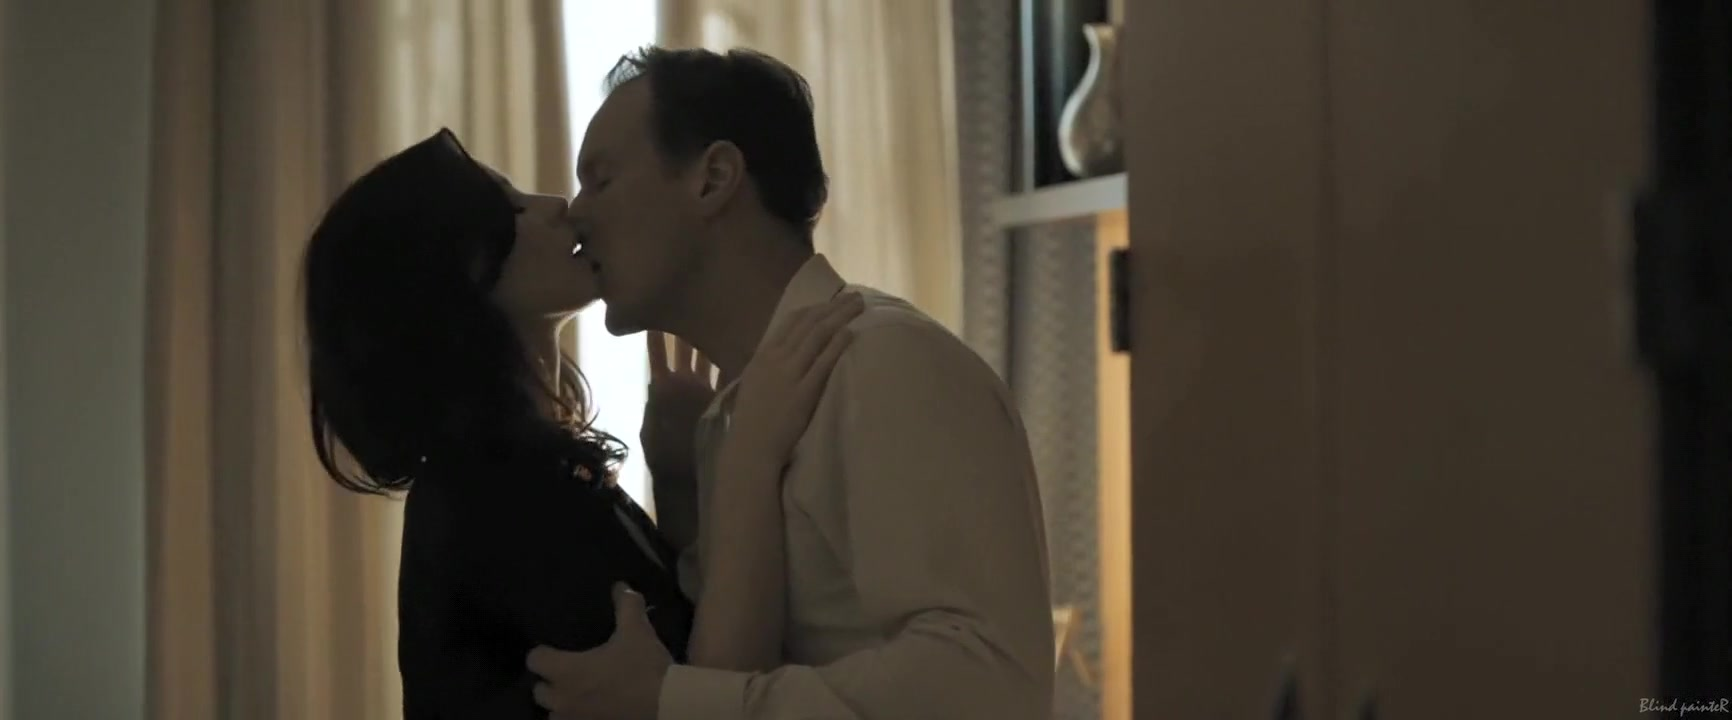 Porn tube Banglo berkunci online dating